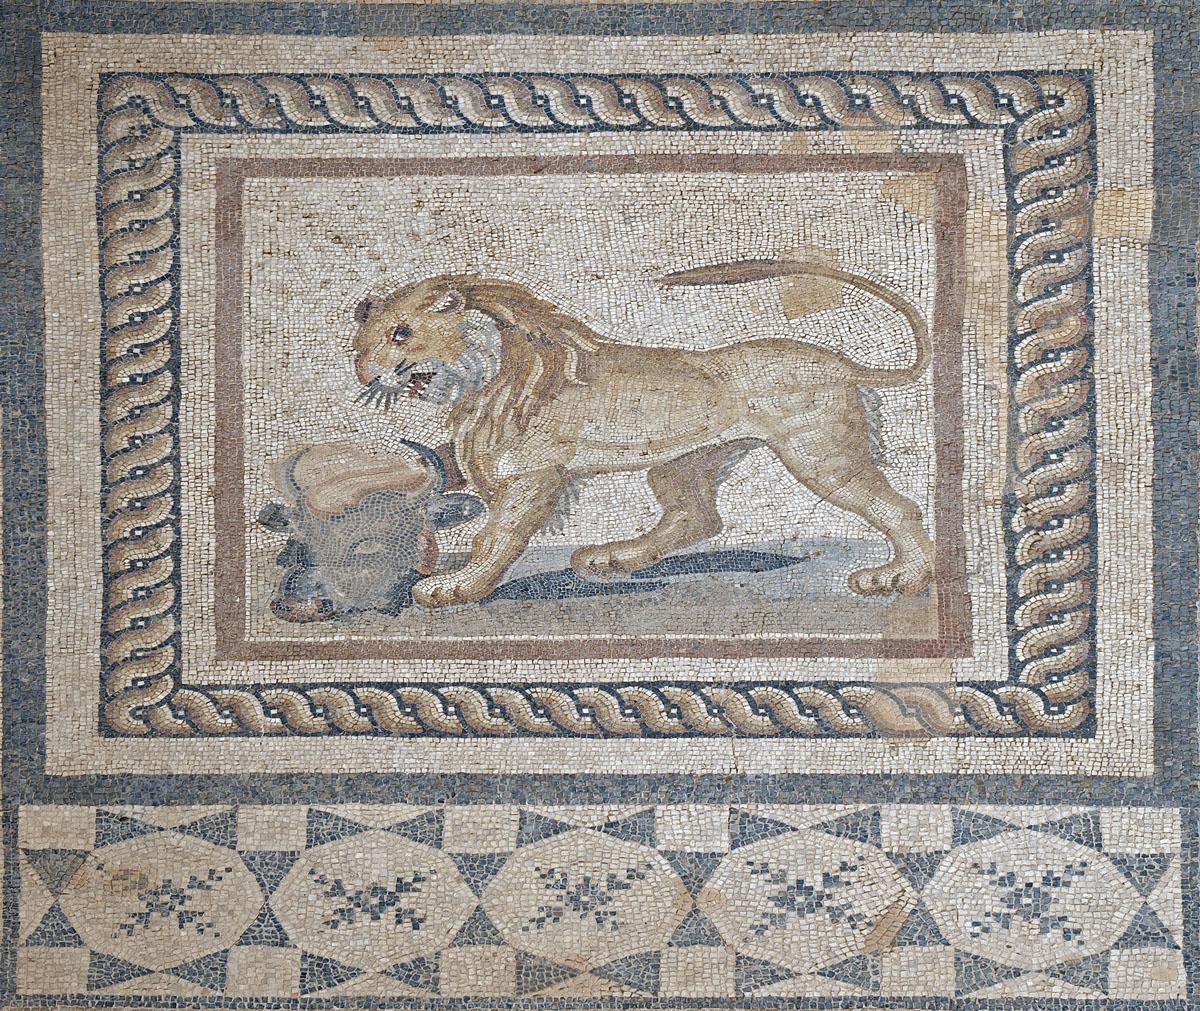 Ephesus March 2011 3685.jpg